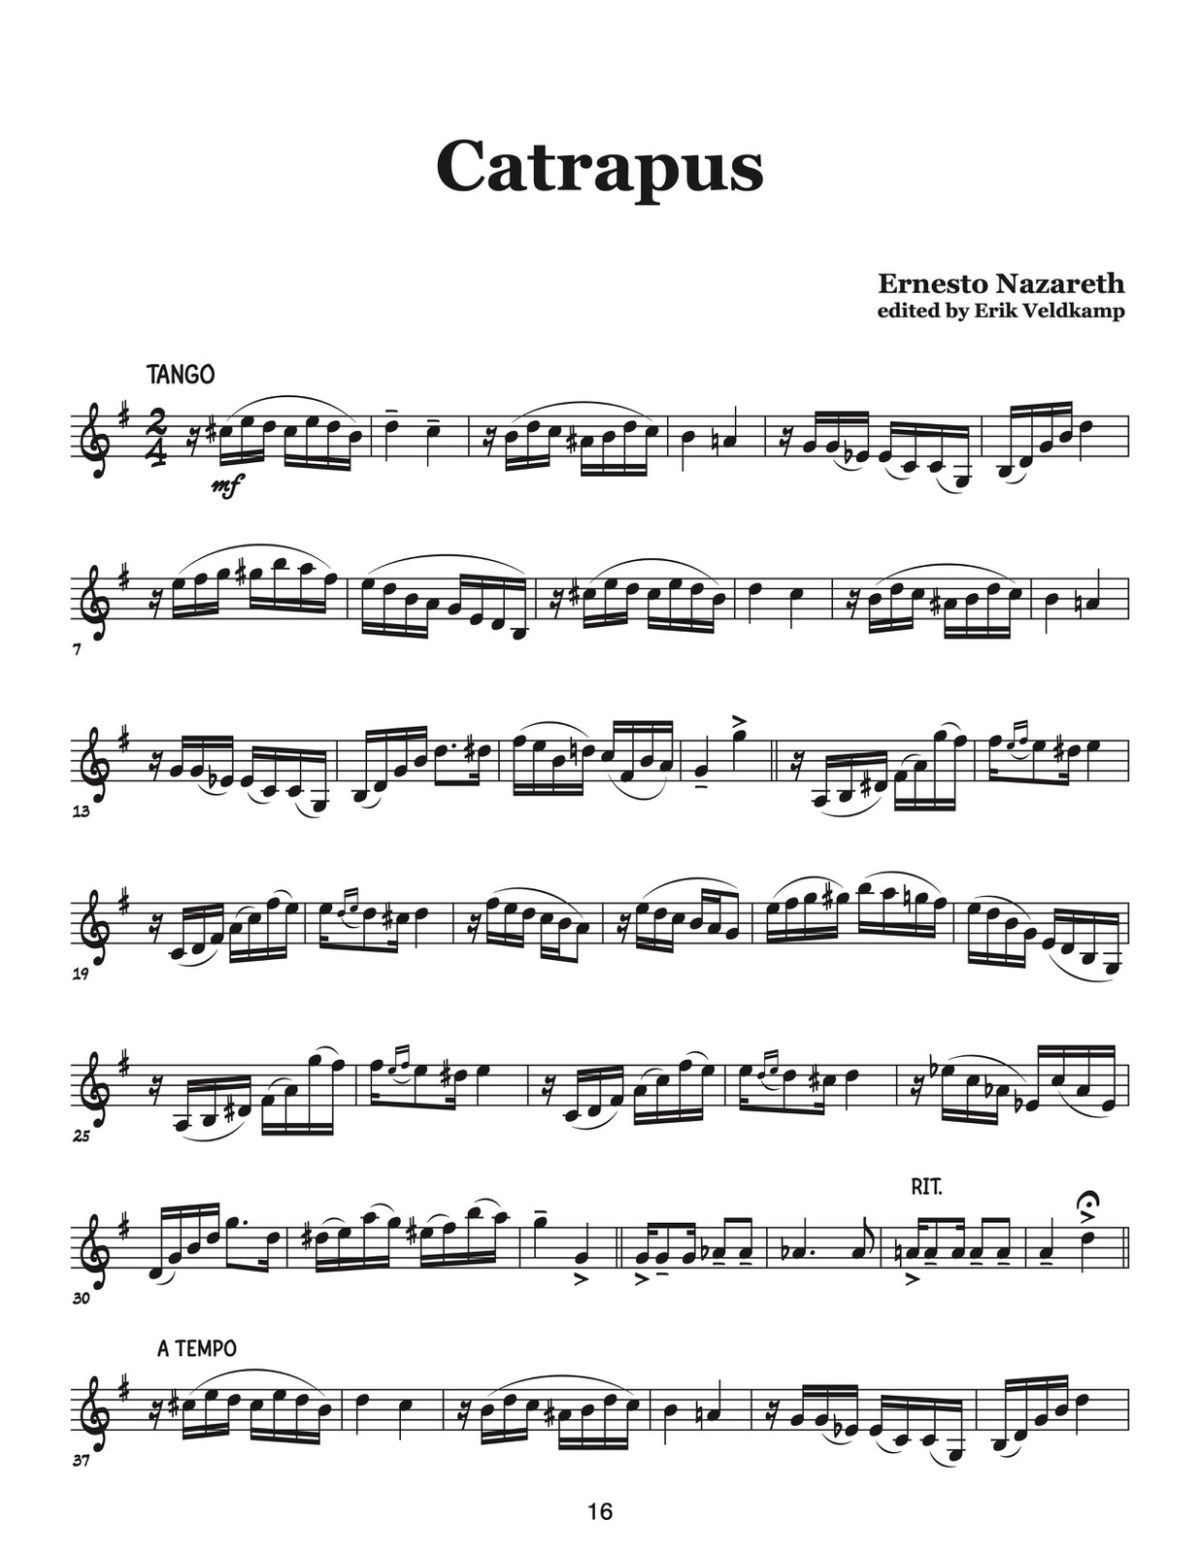 Veldkamp-Nazareth, 15 Brazilian Tangos & Polkas for Trumpet-p16